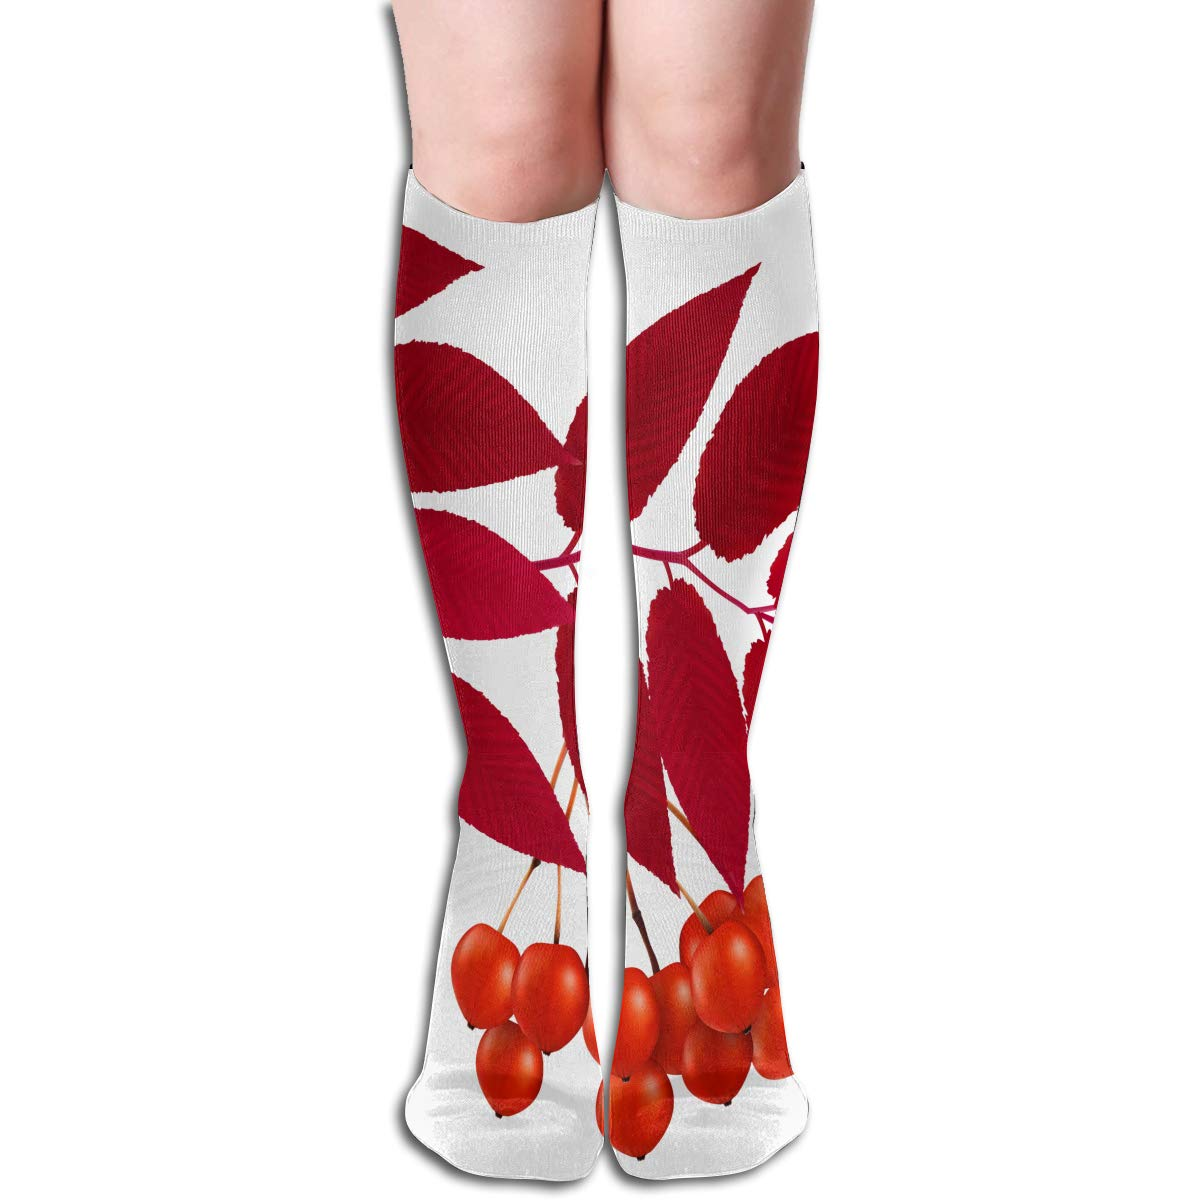 Women Socks Over Knee Red Lips Winter Unique For Halloween